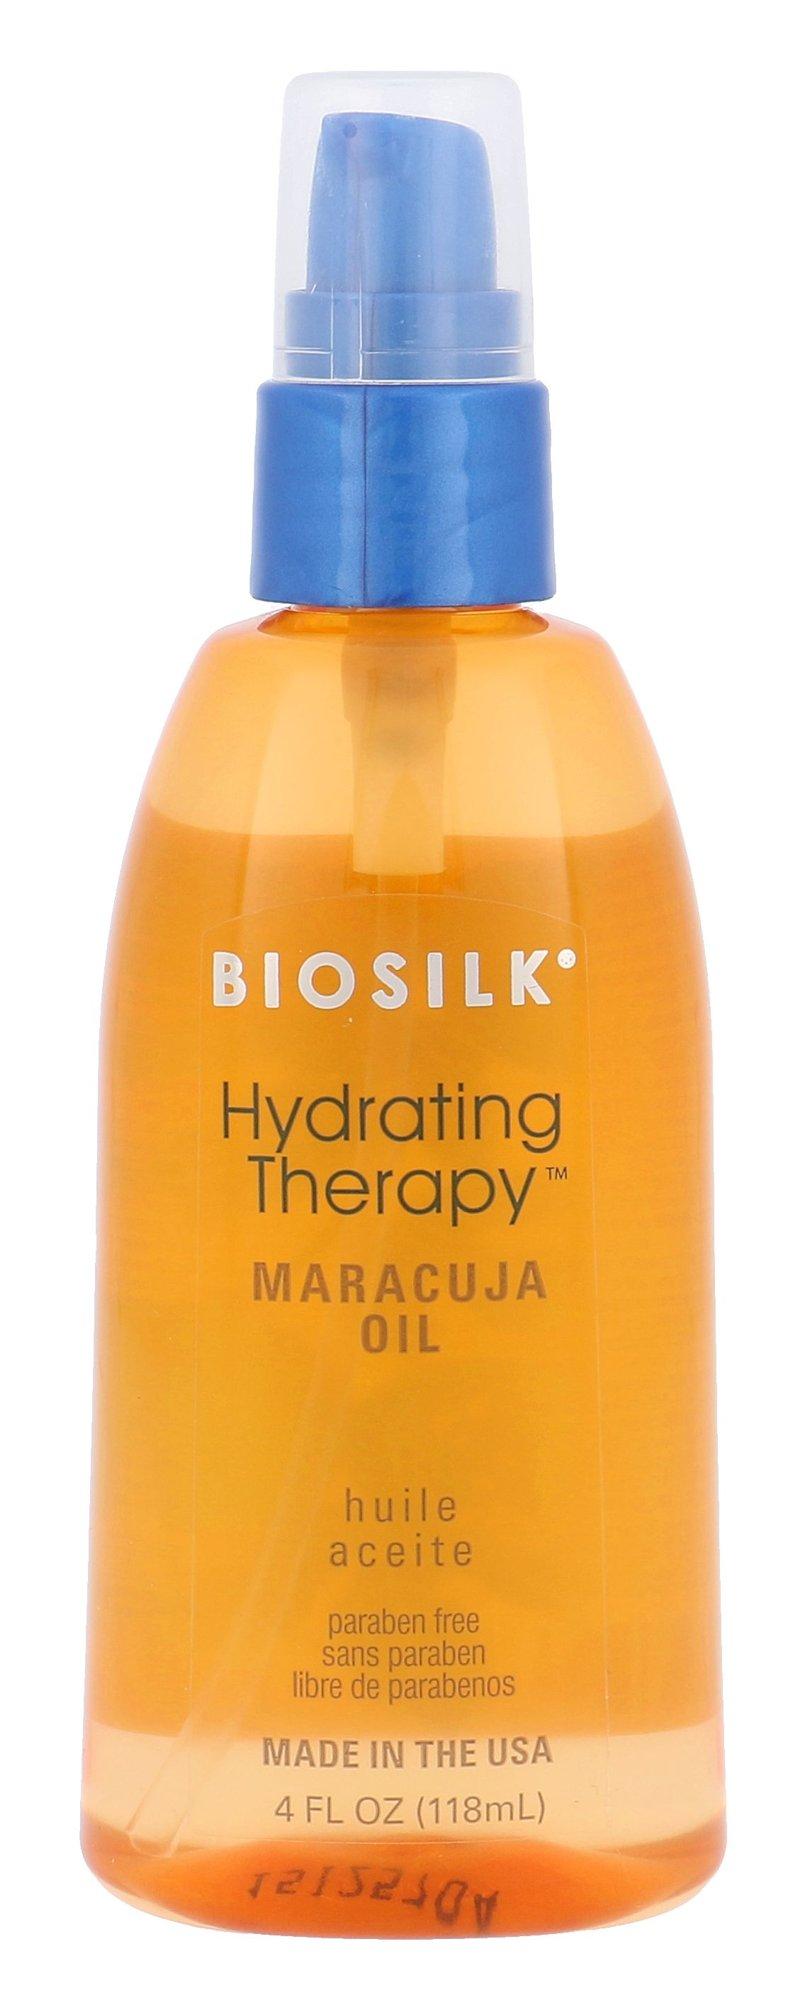 Farouk Systems Biosilk Hydrating Therapy Maracuja Oil Cosmetic 118ml